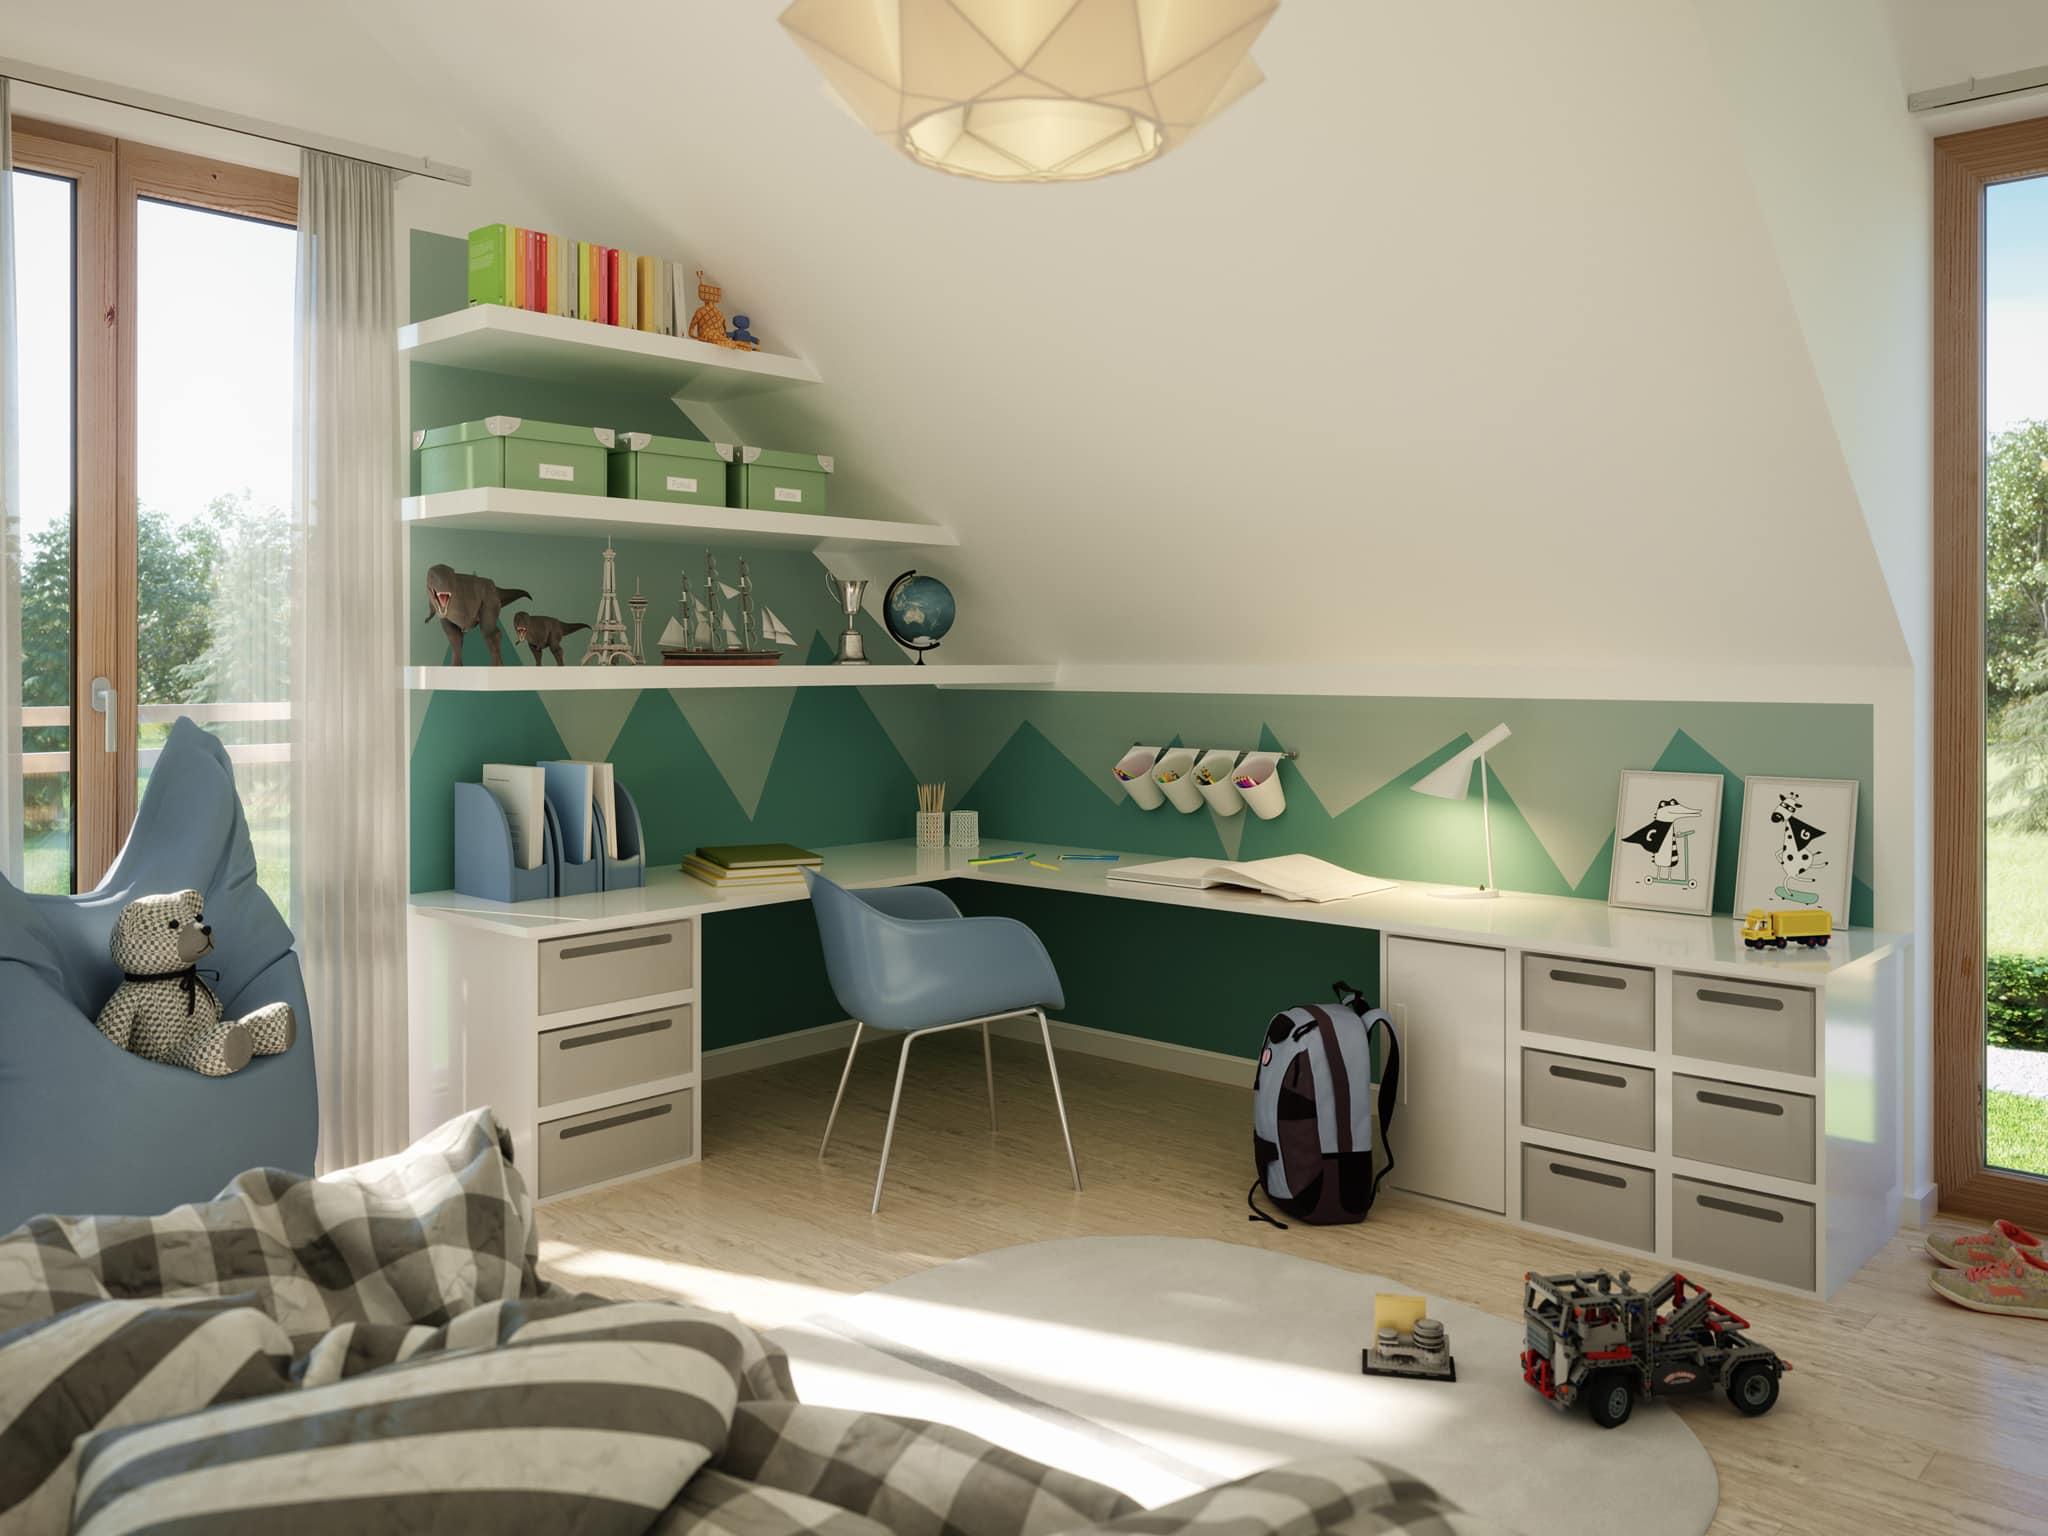 Kinderzimmer Ideen - Inneneinrichtung Einfamilienhaus Living Haus SUNSHINE 154 V4 - HausbauDirekt.de